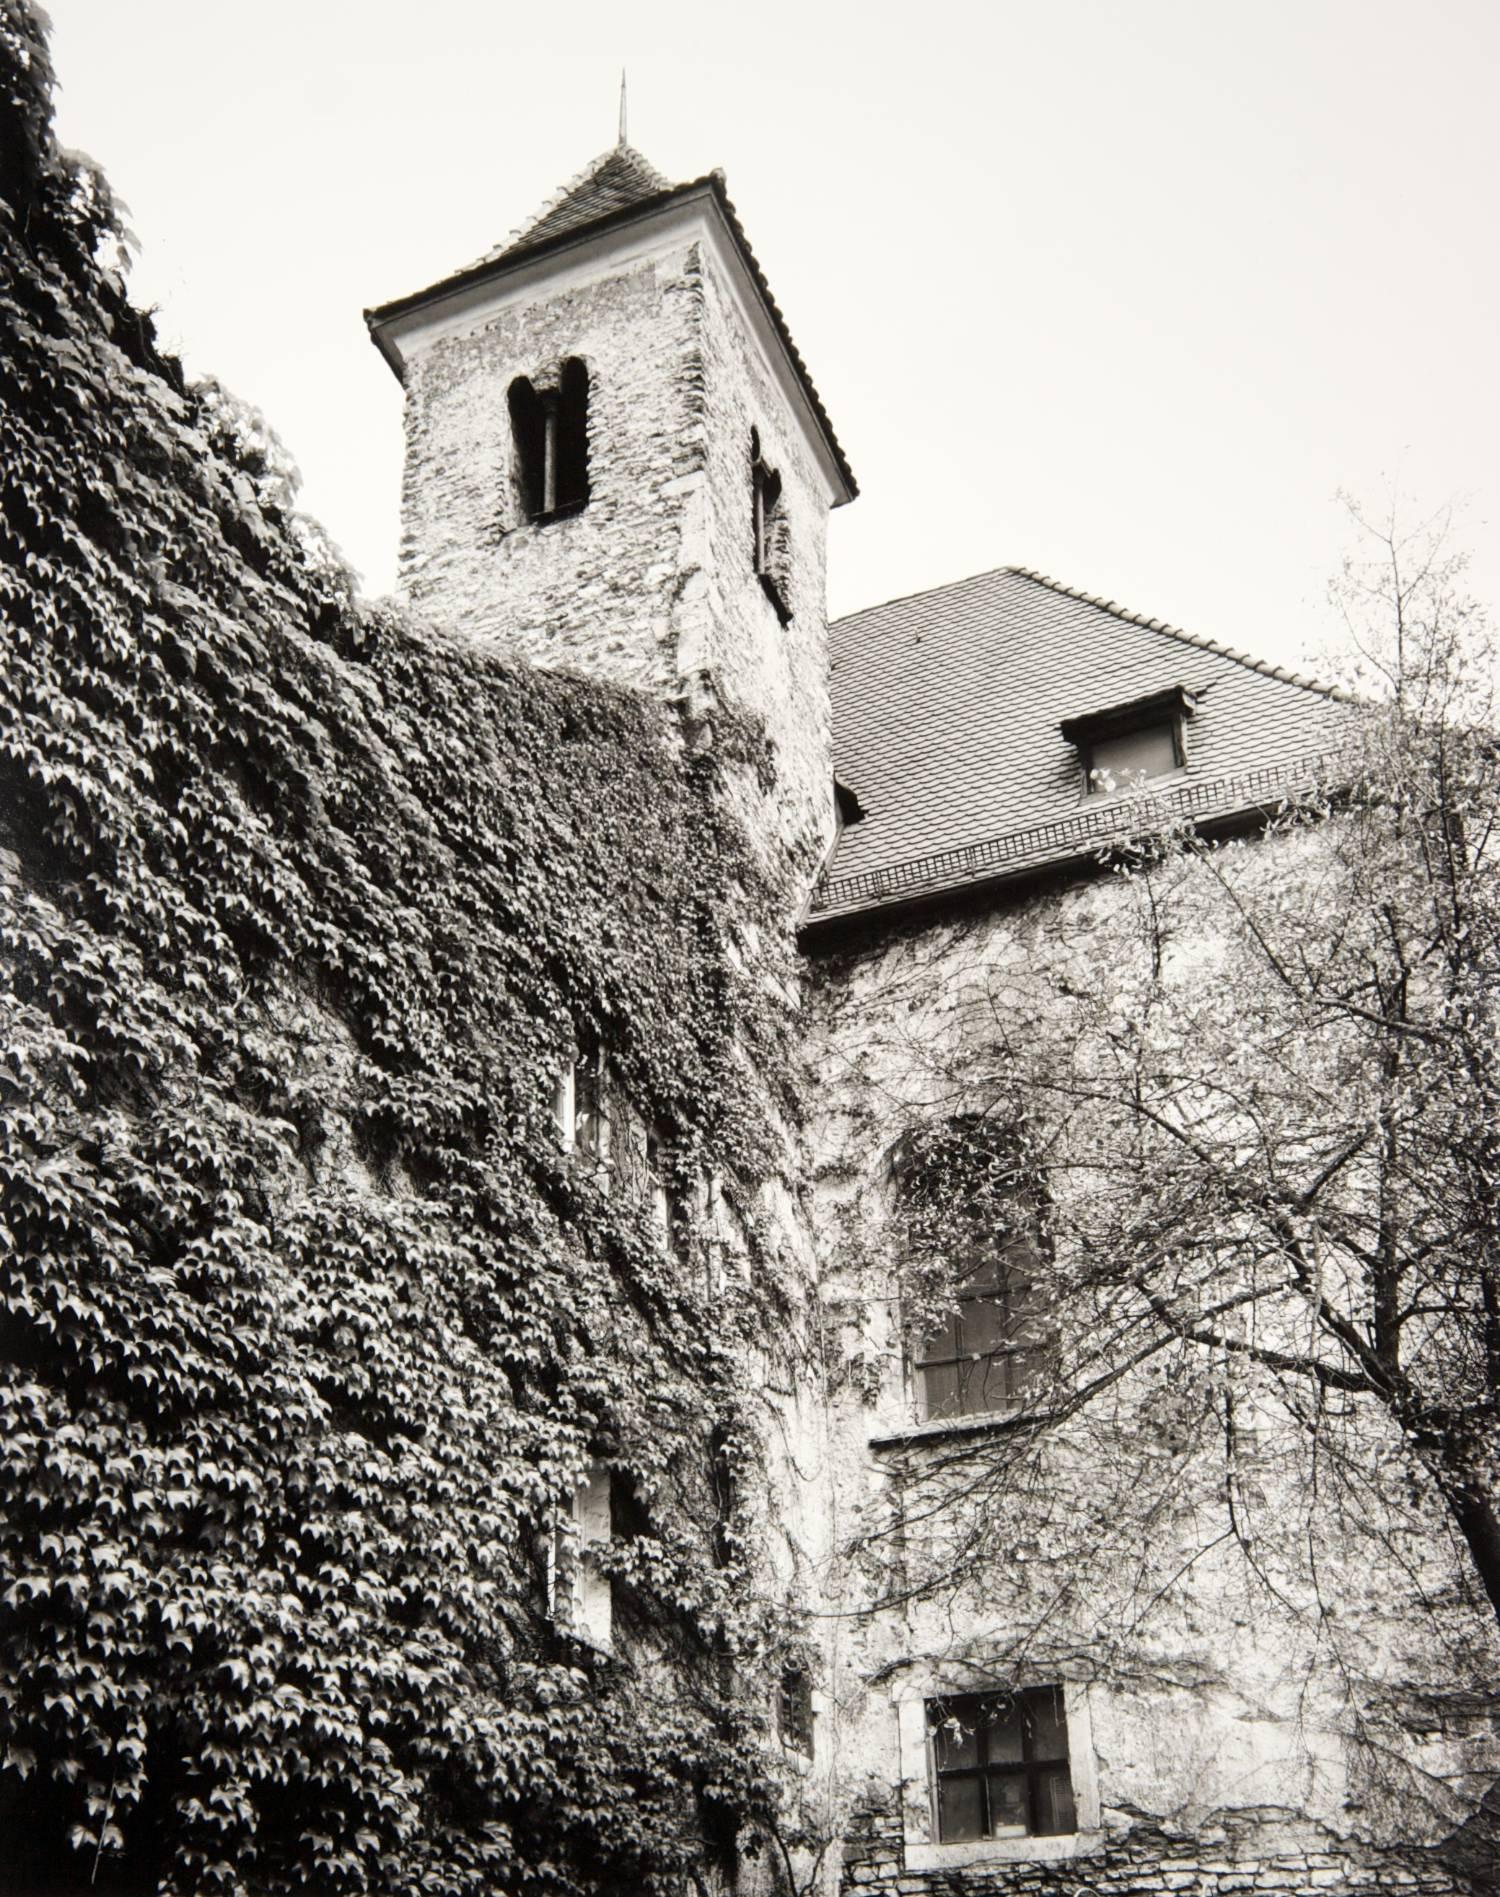 Tower (Regensburg, Germany)